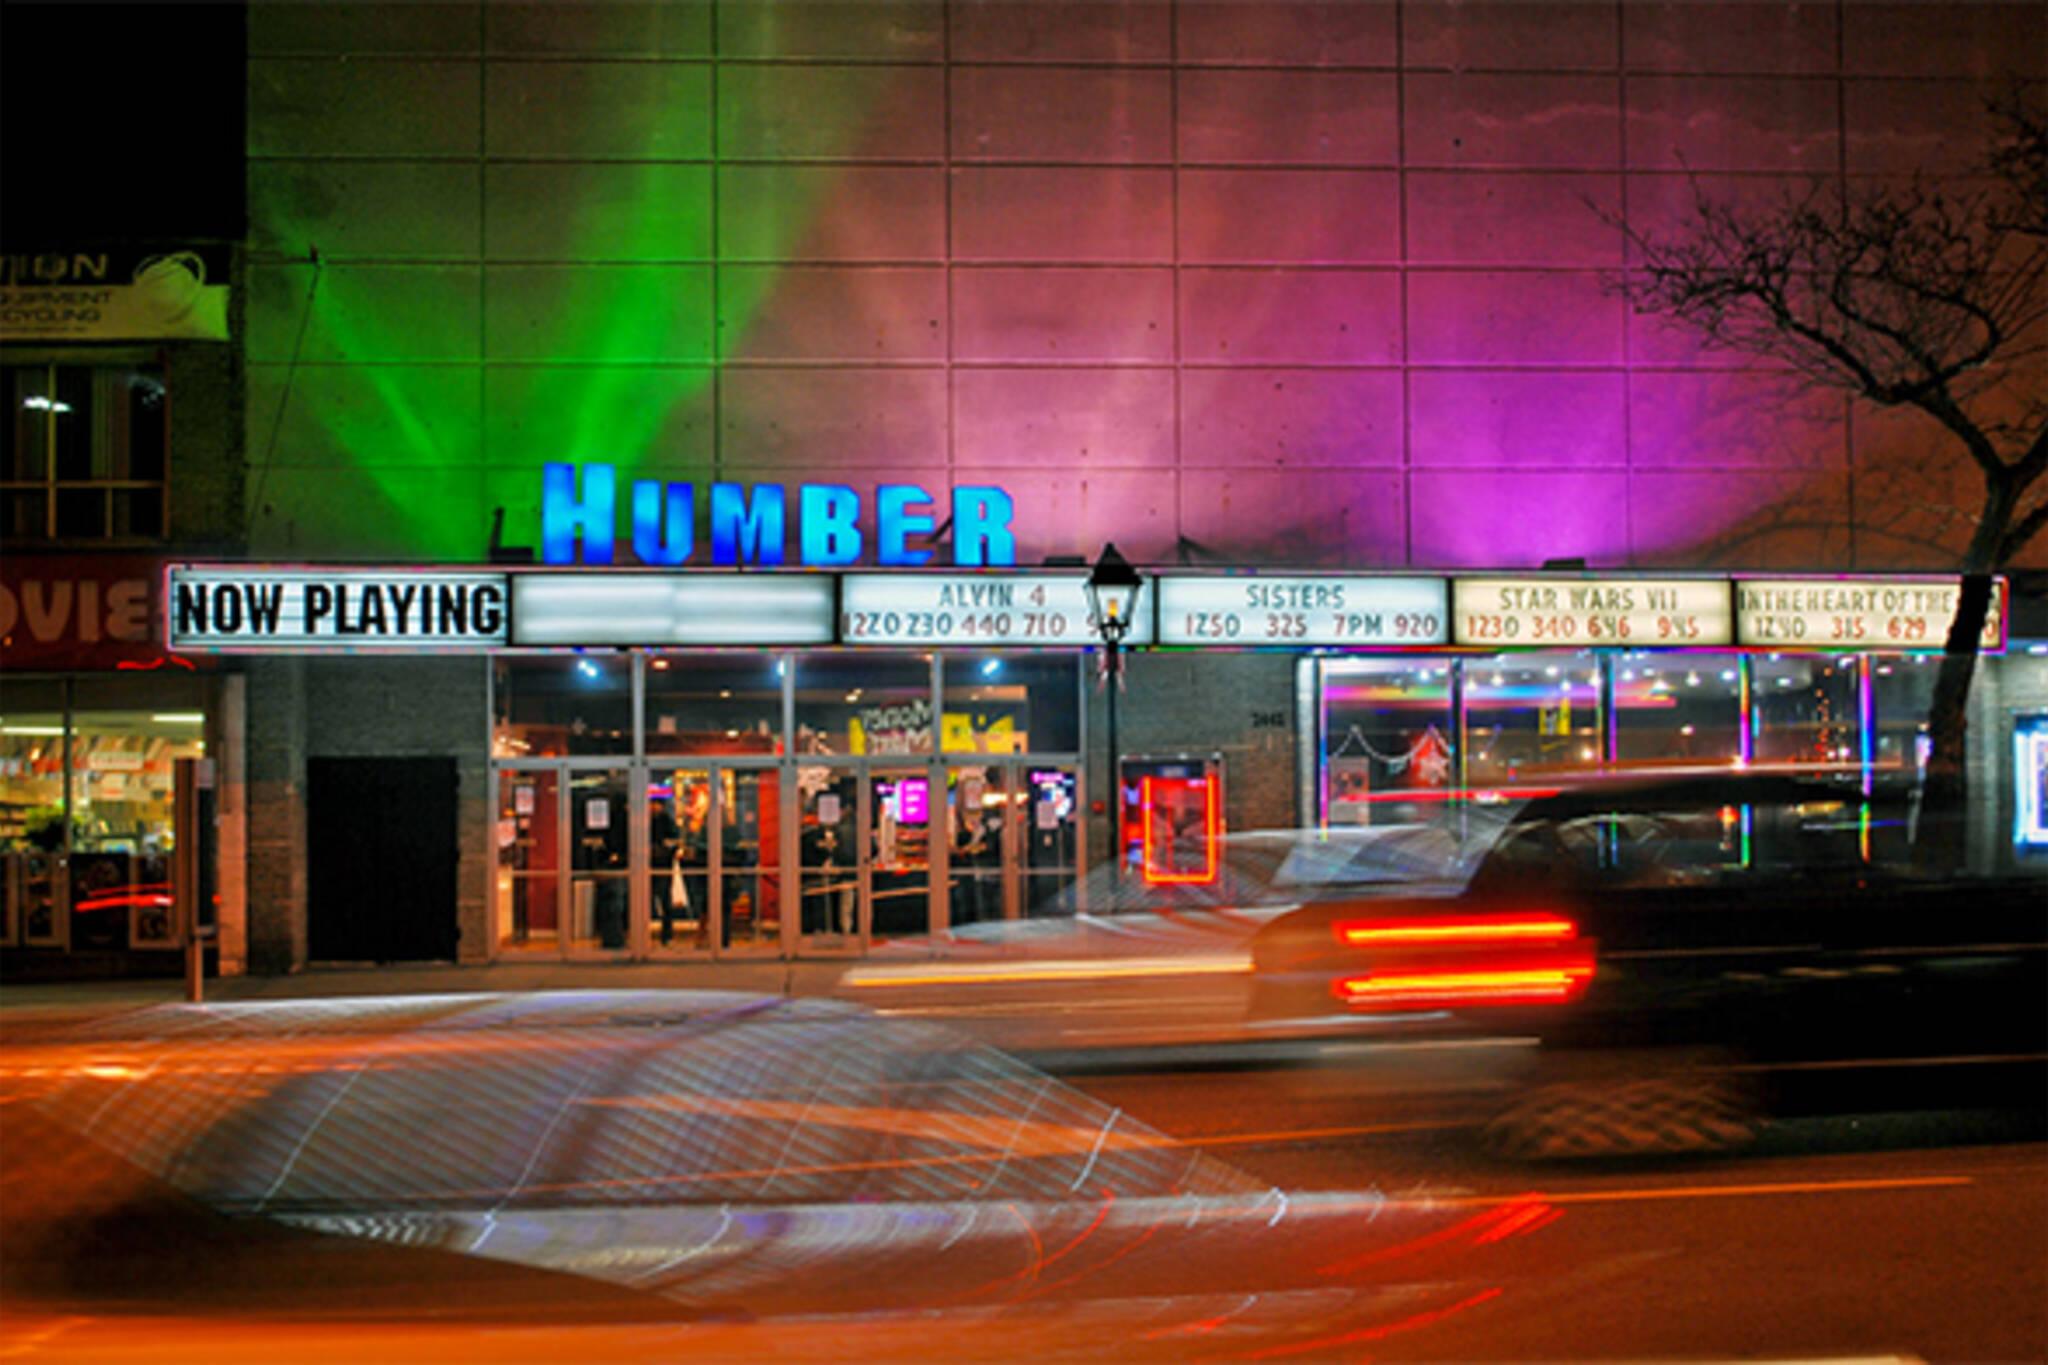 Humber Cinema condos